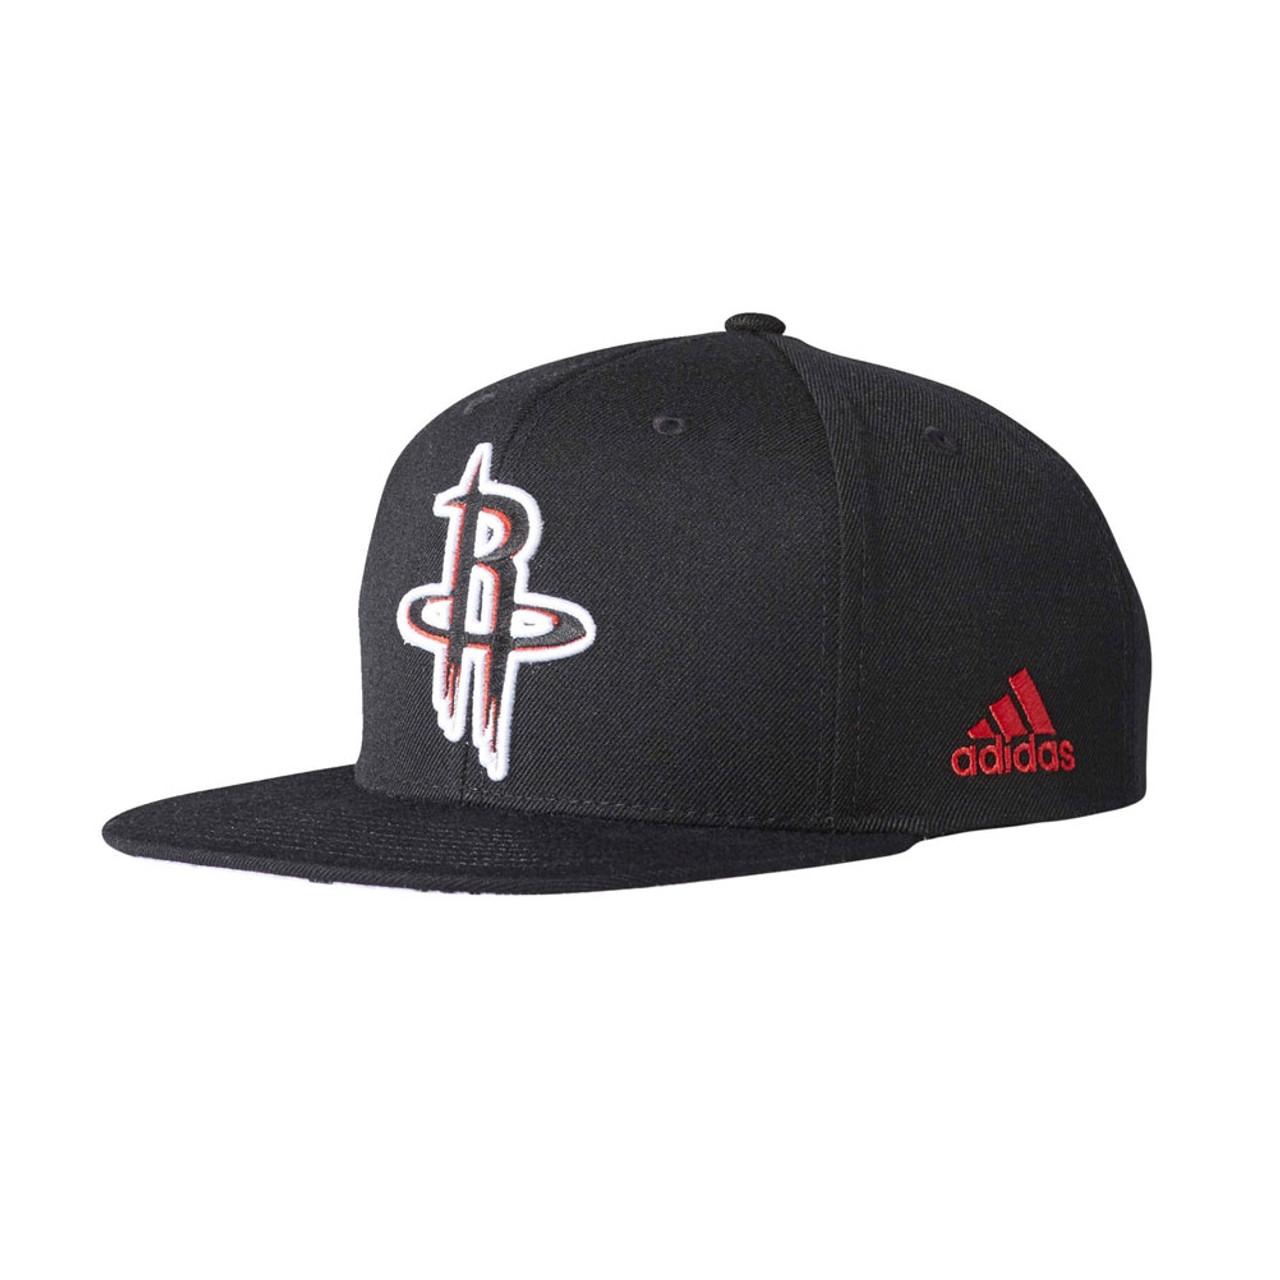 ADIDAS houston rockets basketball snapback flat cap  black  95bf358045b